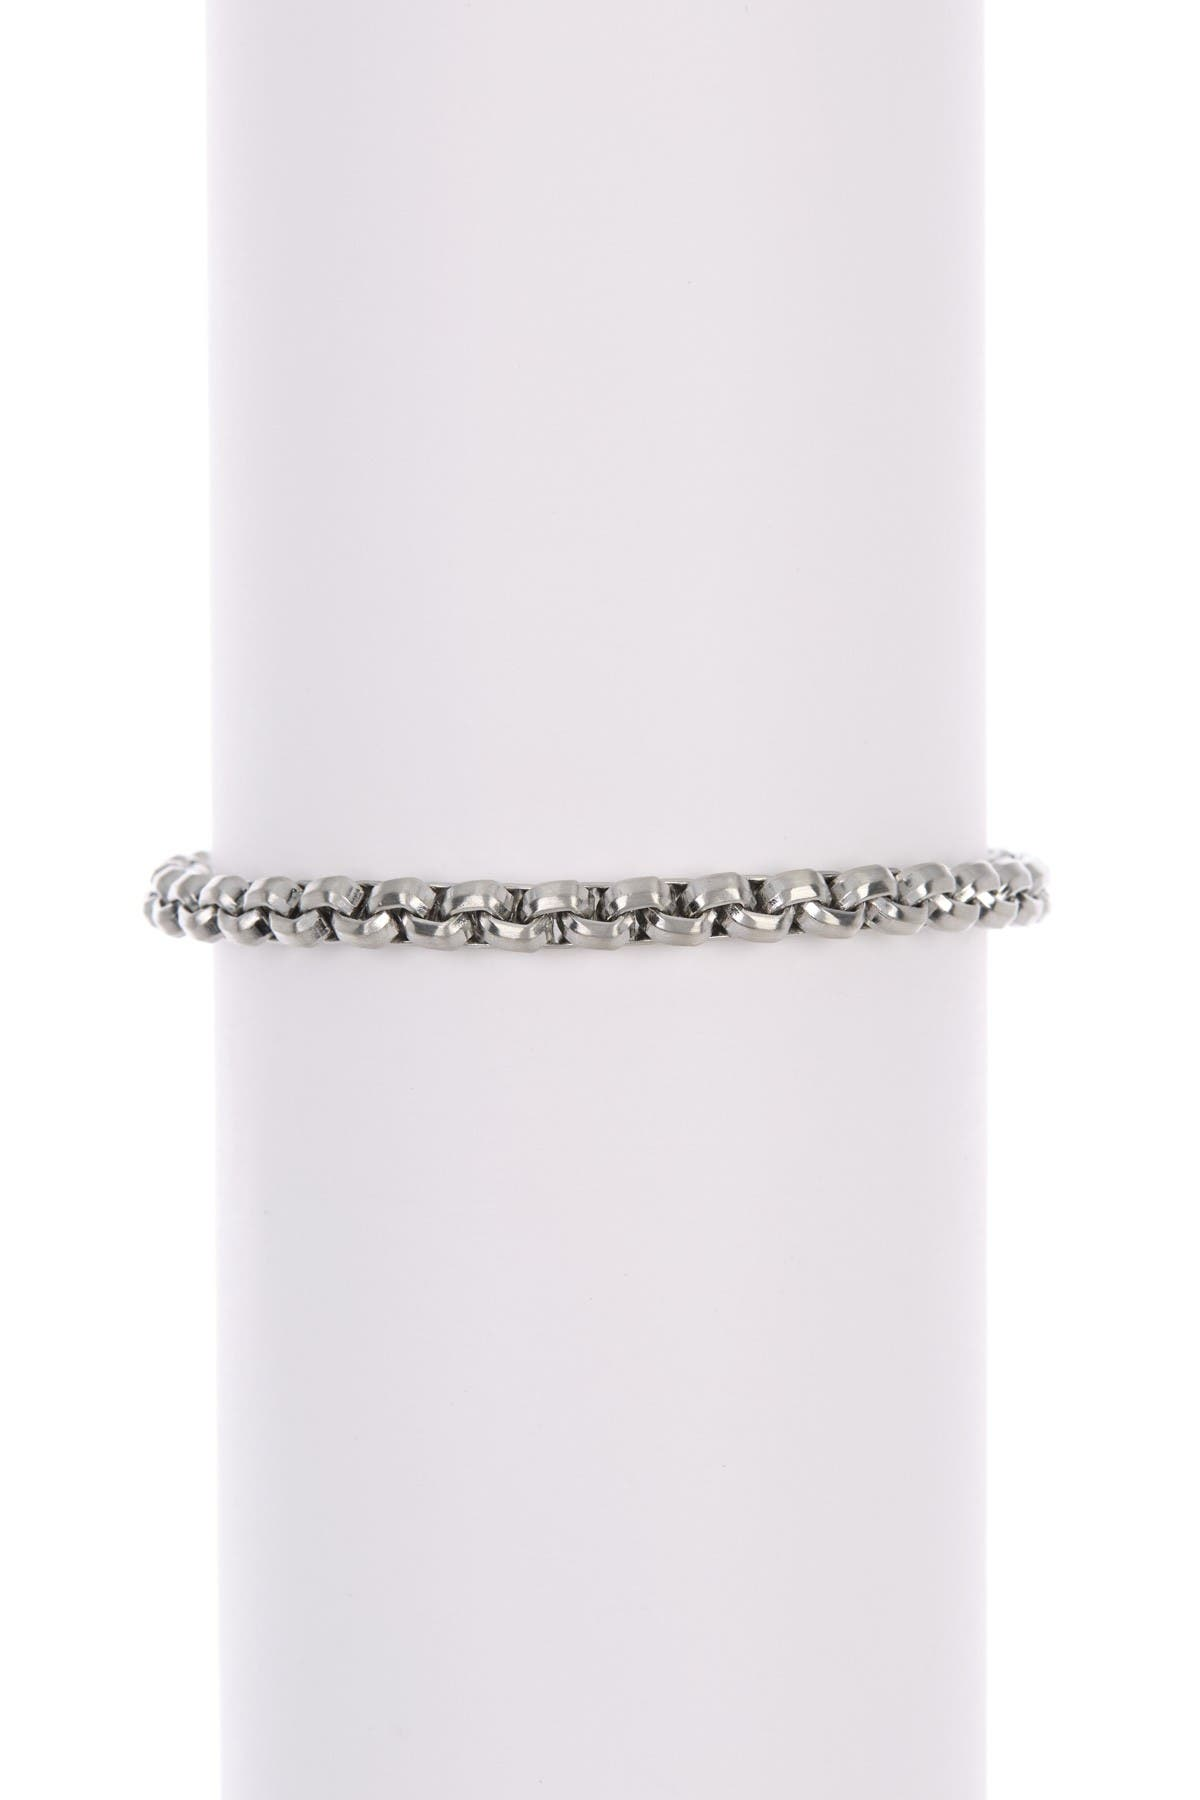 Image of William Rast Thick Round Box Bracelet